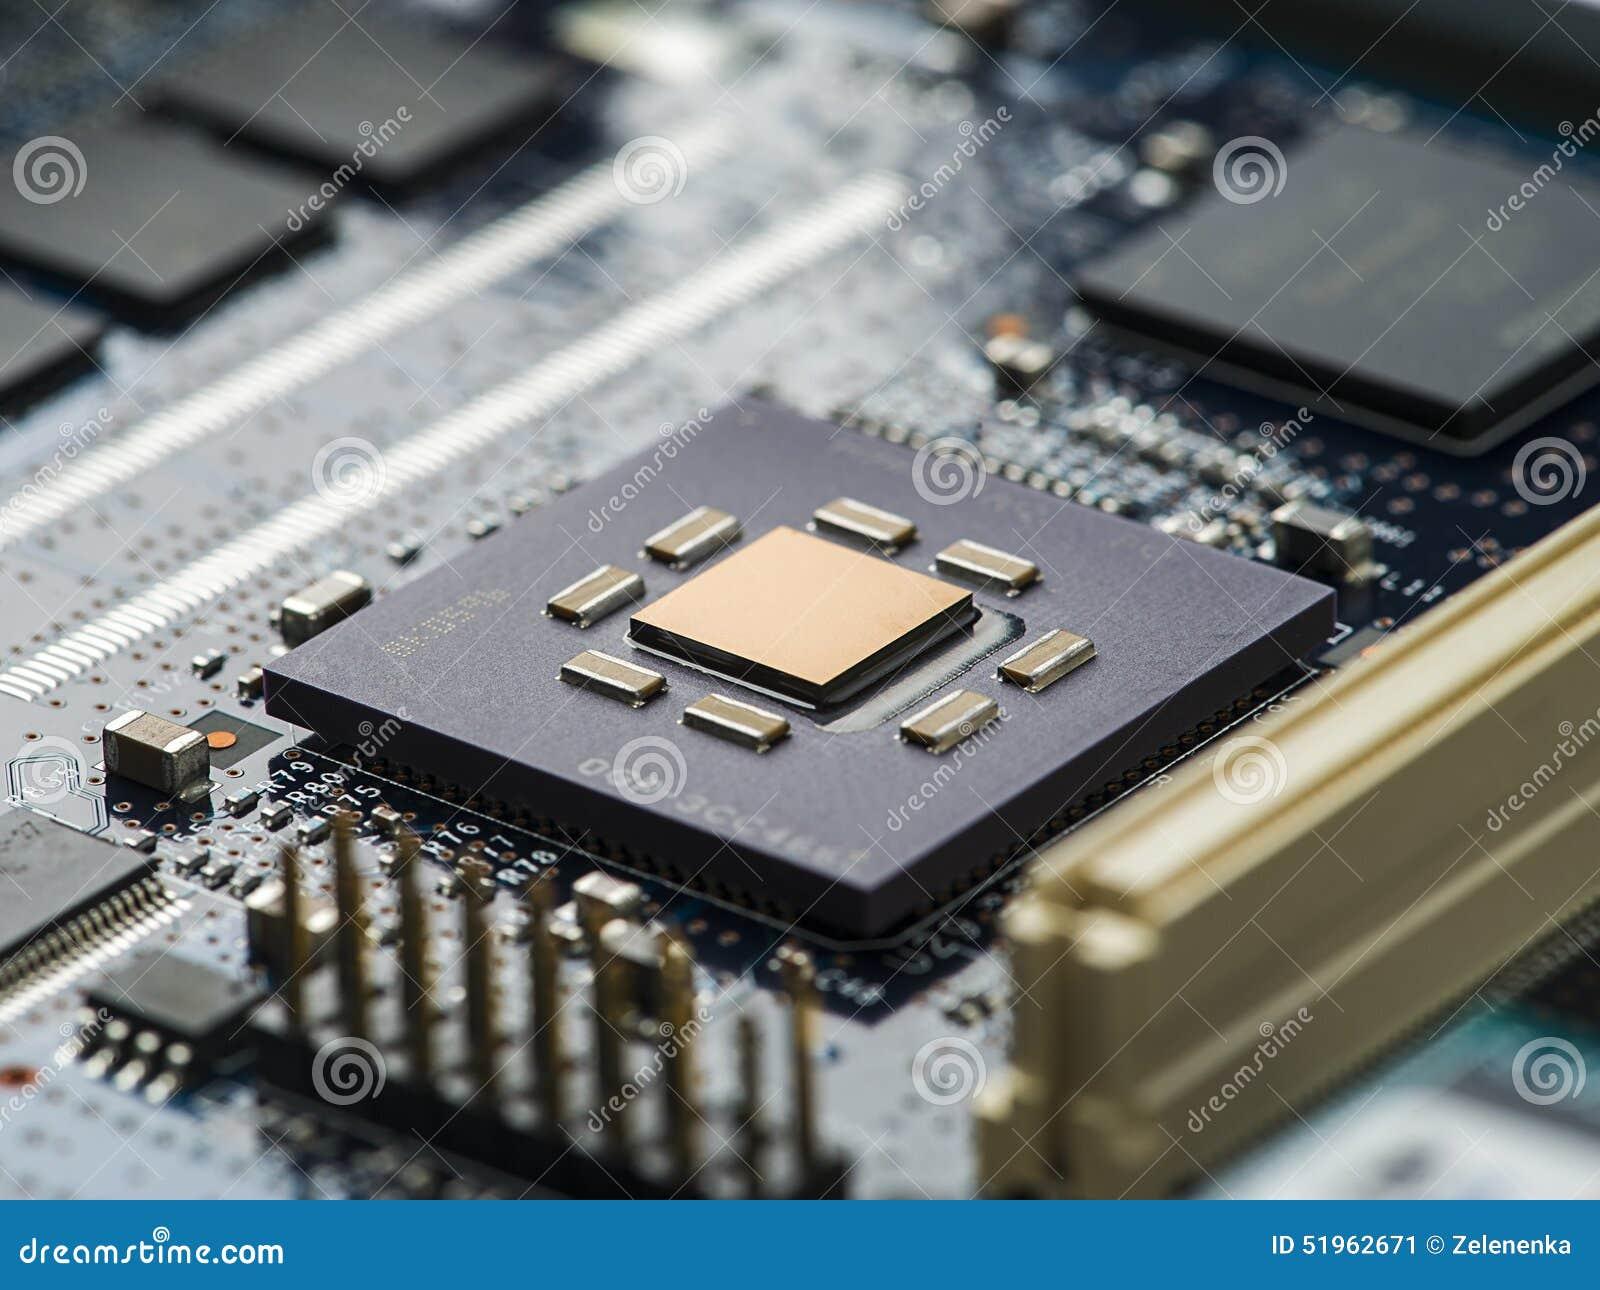 high tech circuit board close up  macro  concept of